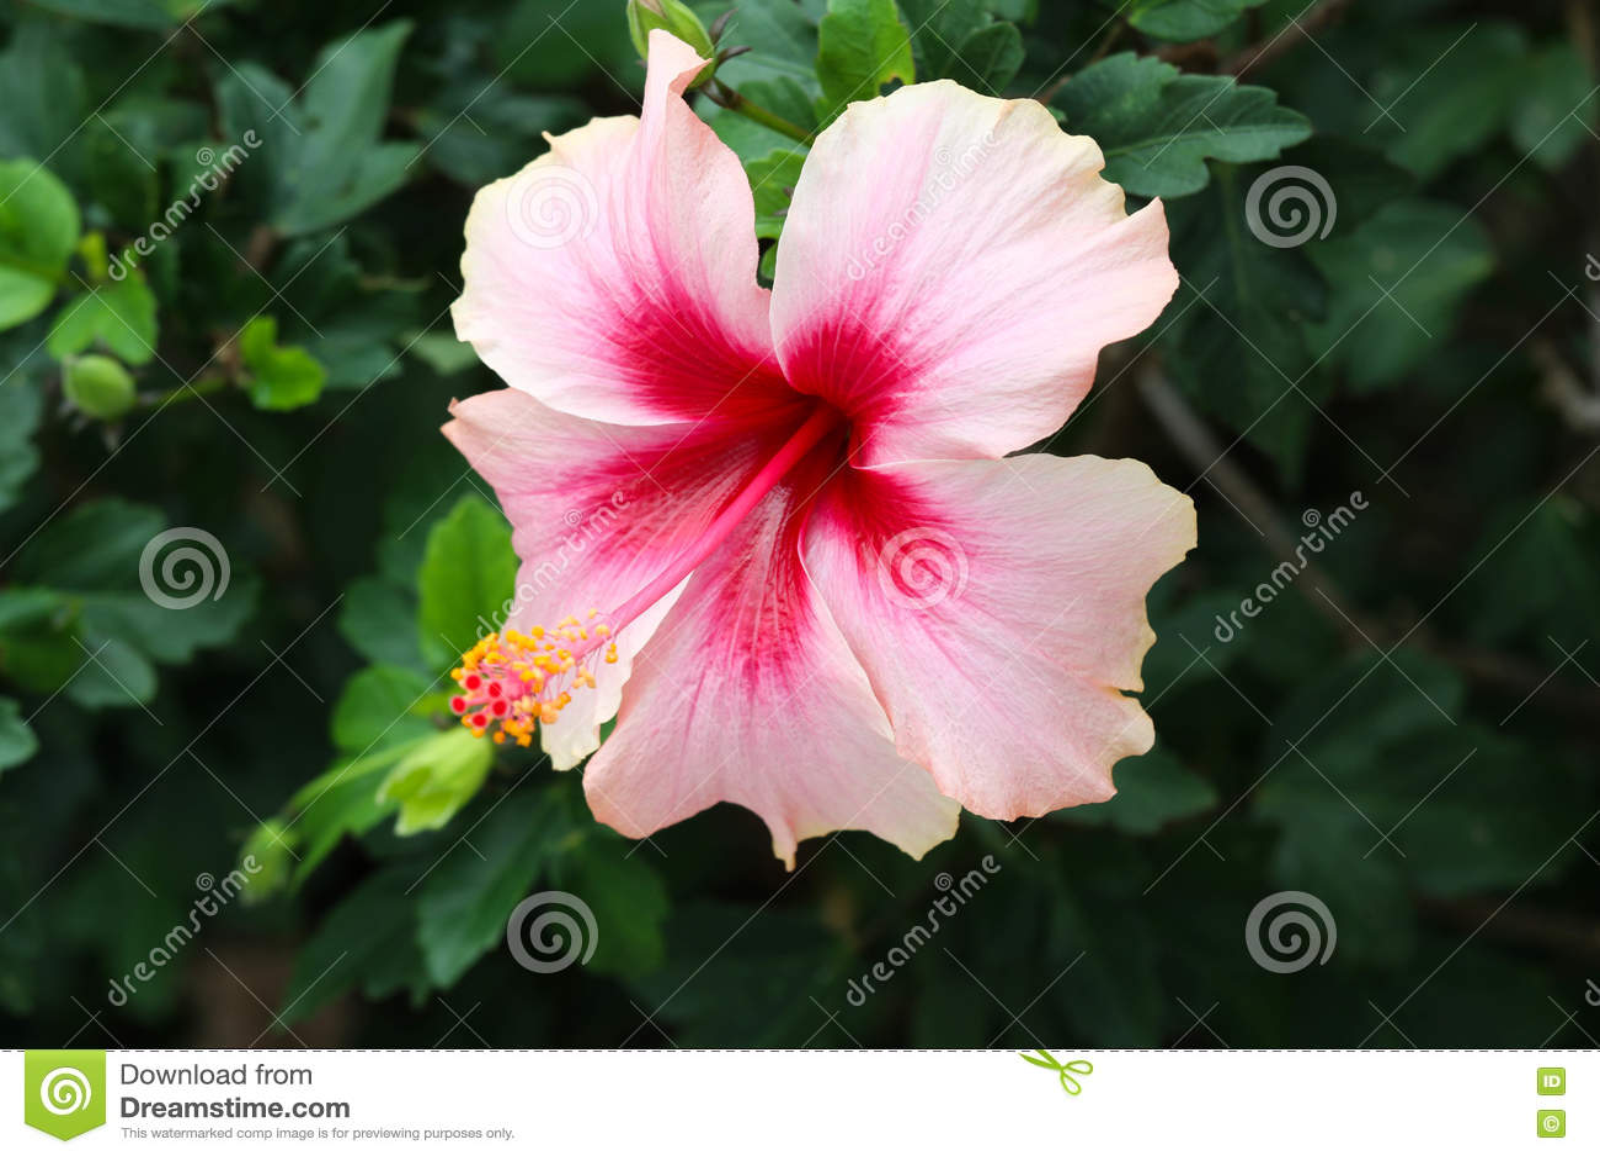 Shoeflowers in the garden stock image image of hawaiian 81985945 beautiful flower shoeflowers in the garden thailand izmirmasajfo